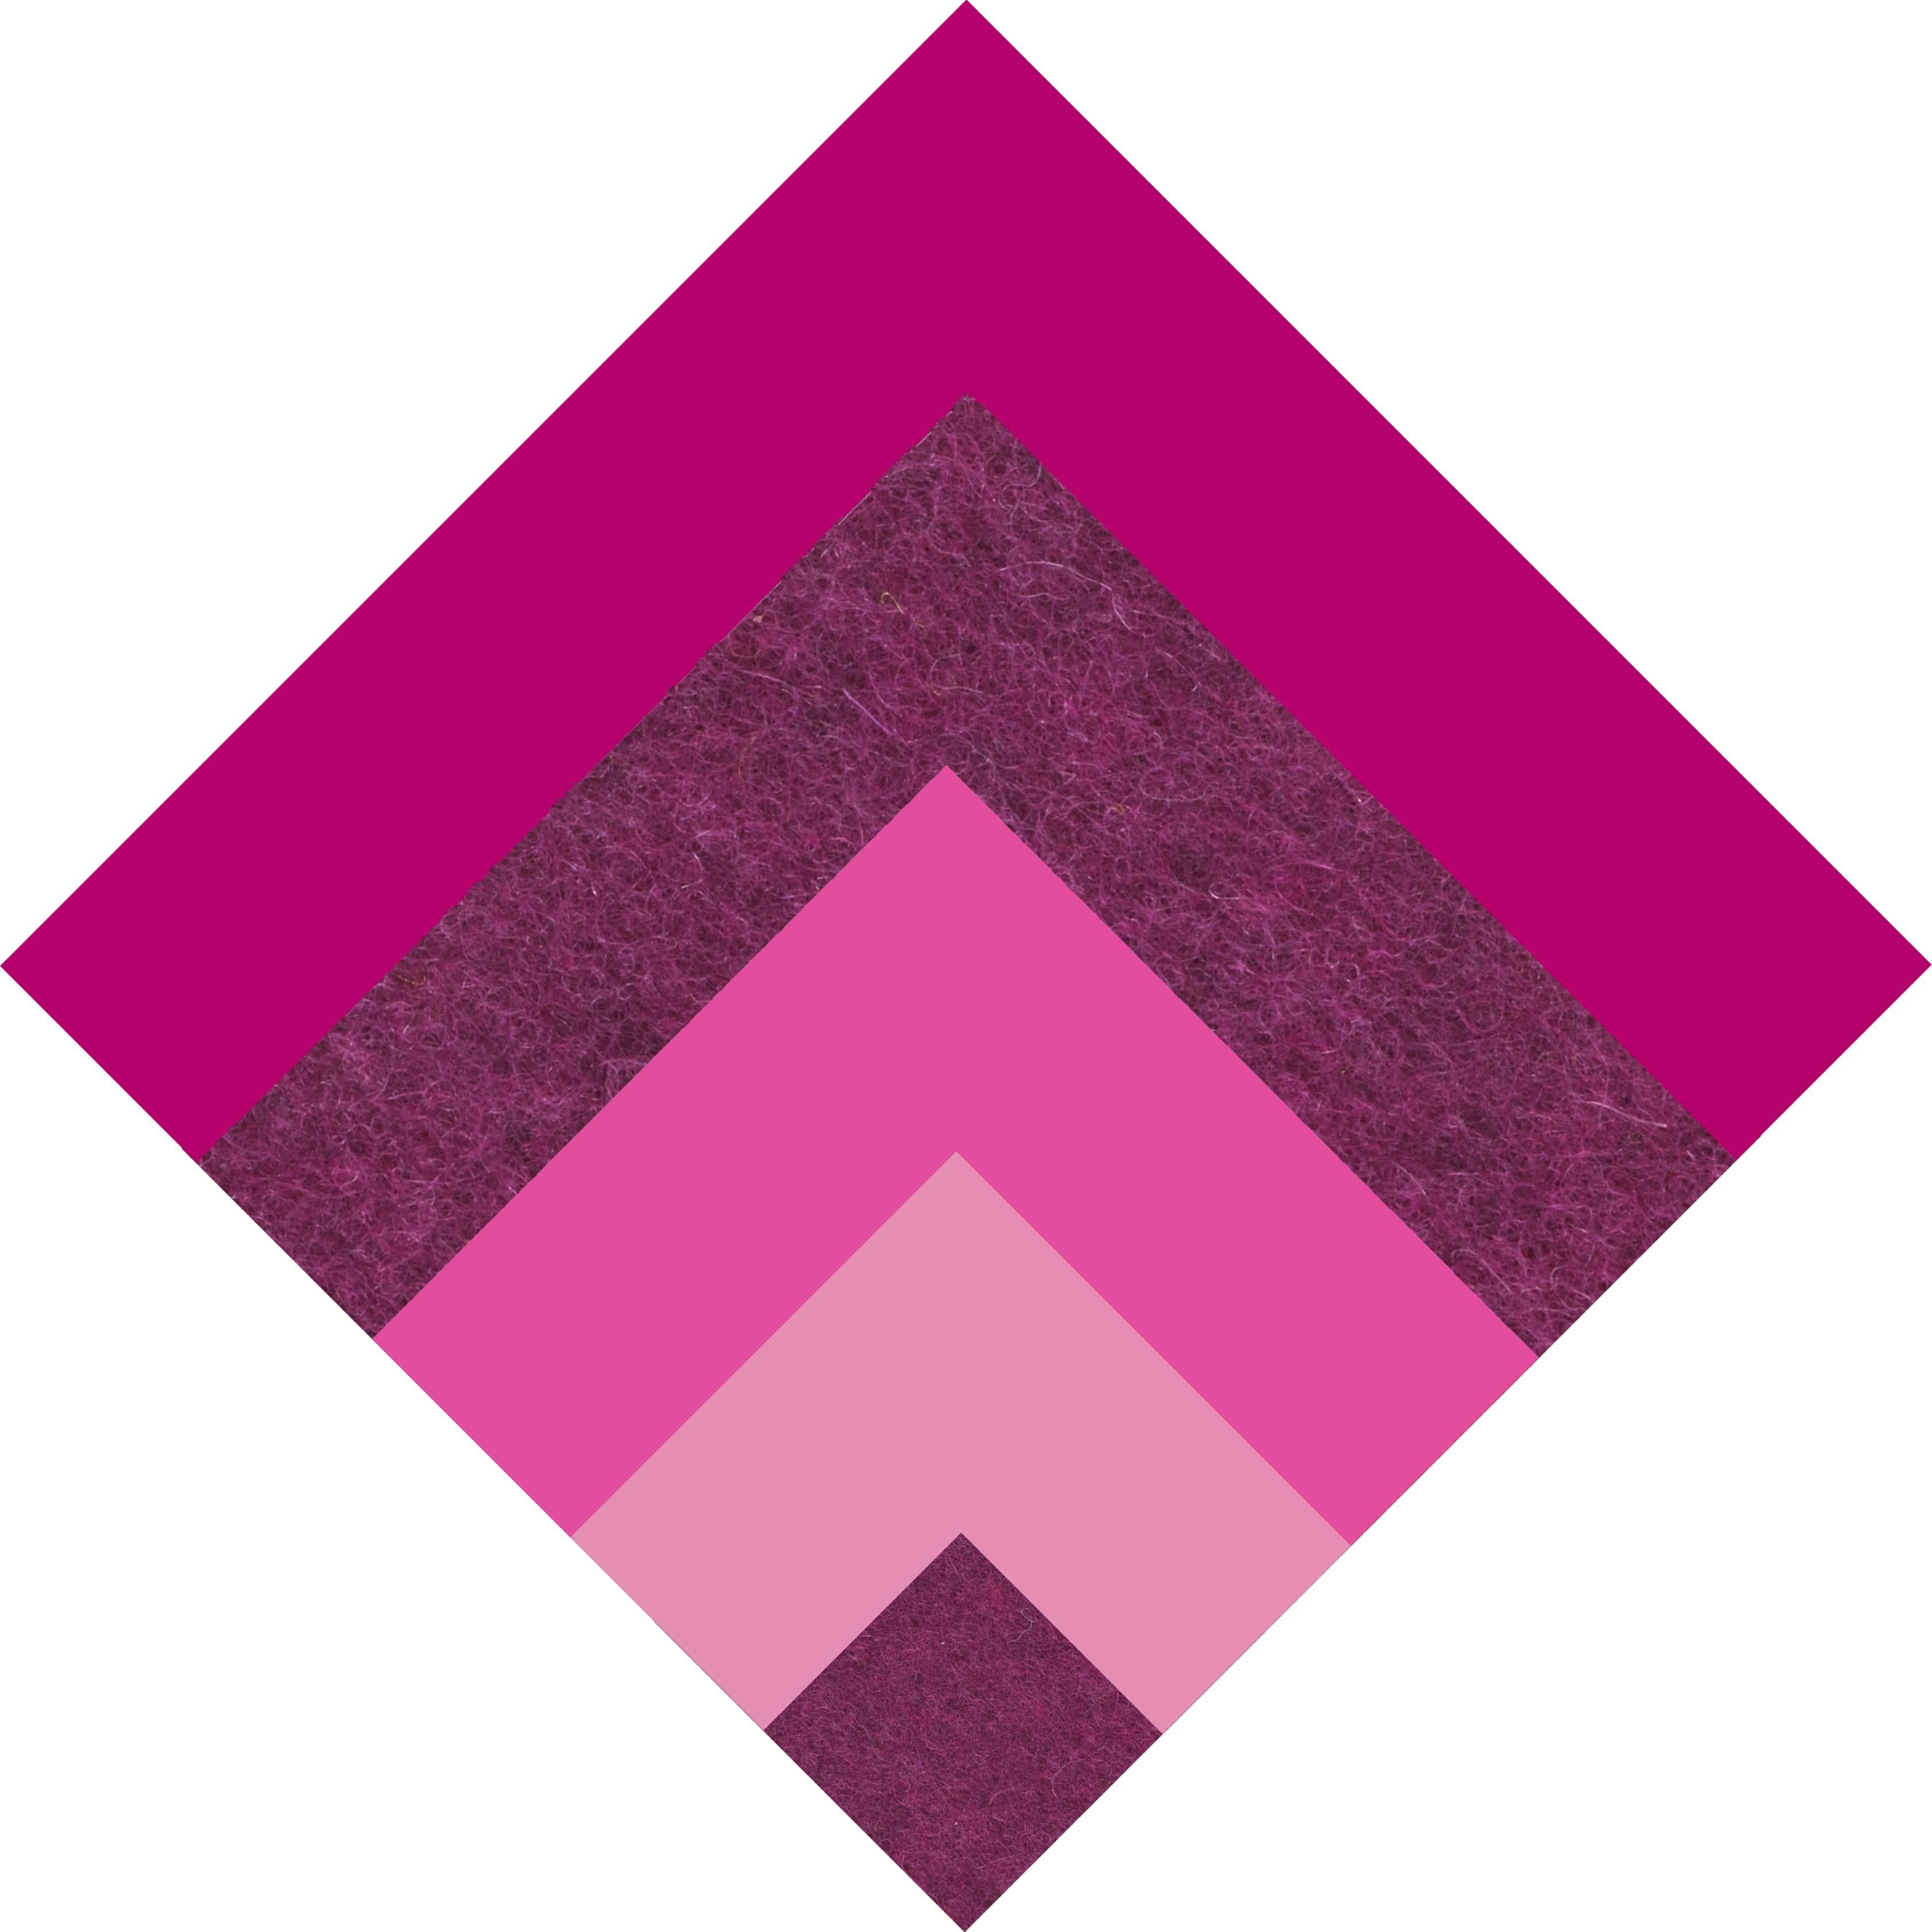 dinner serviette berry malve pink rose daff filz und. Black Bedroom Furniture Sets. Home Design Ideas